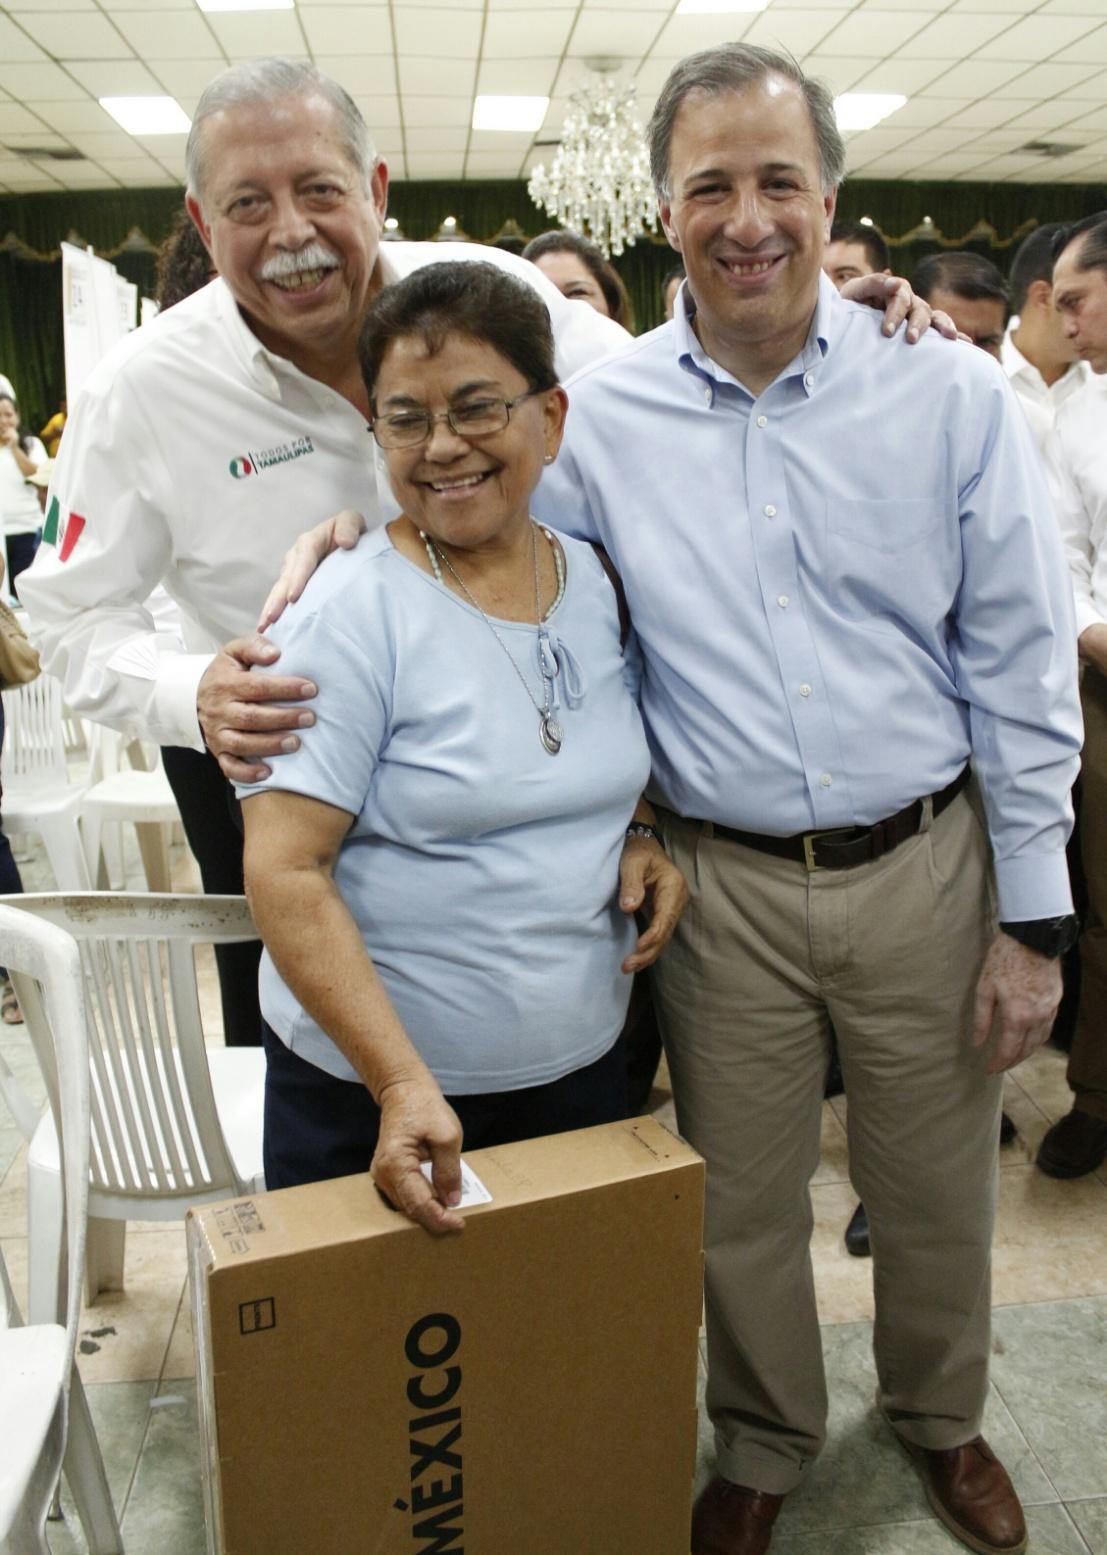 FOTO 4 Gira del secretario Meade en Tamaulipasjpg